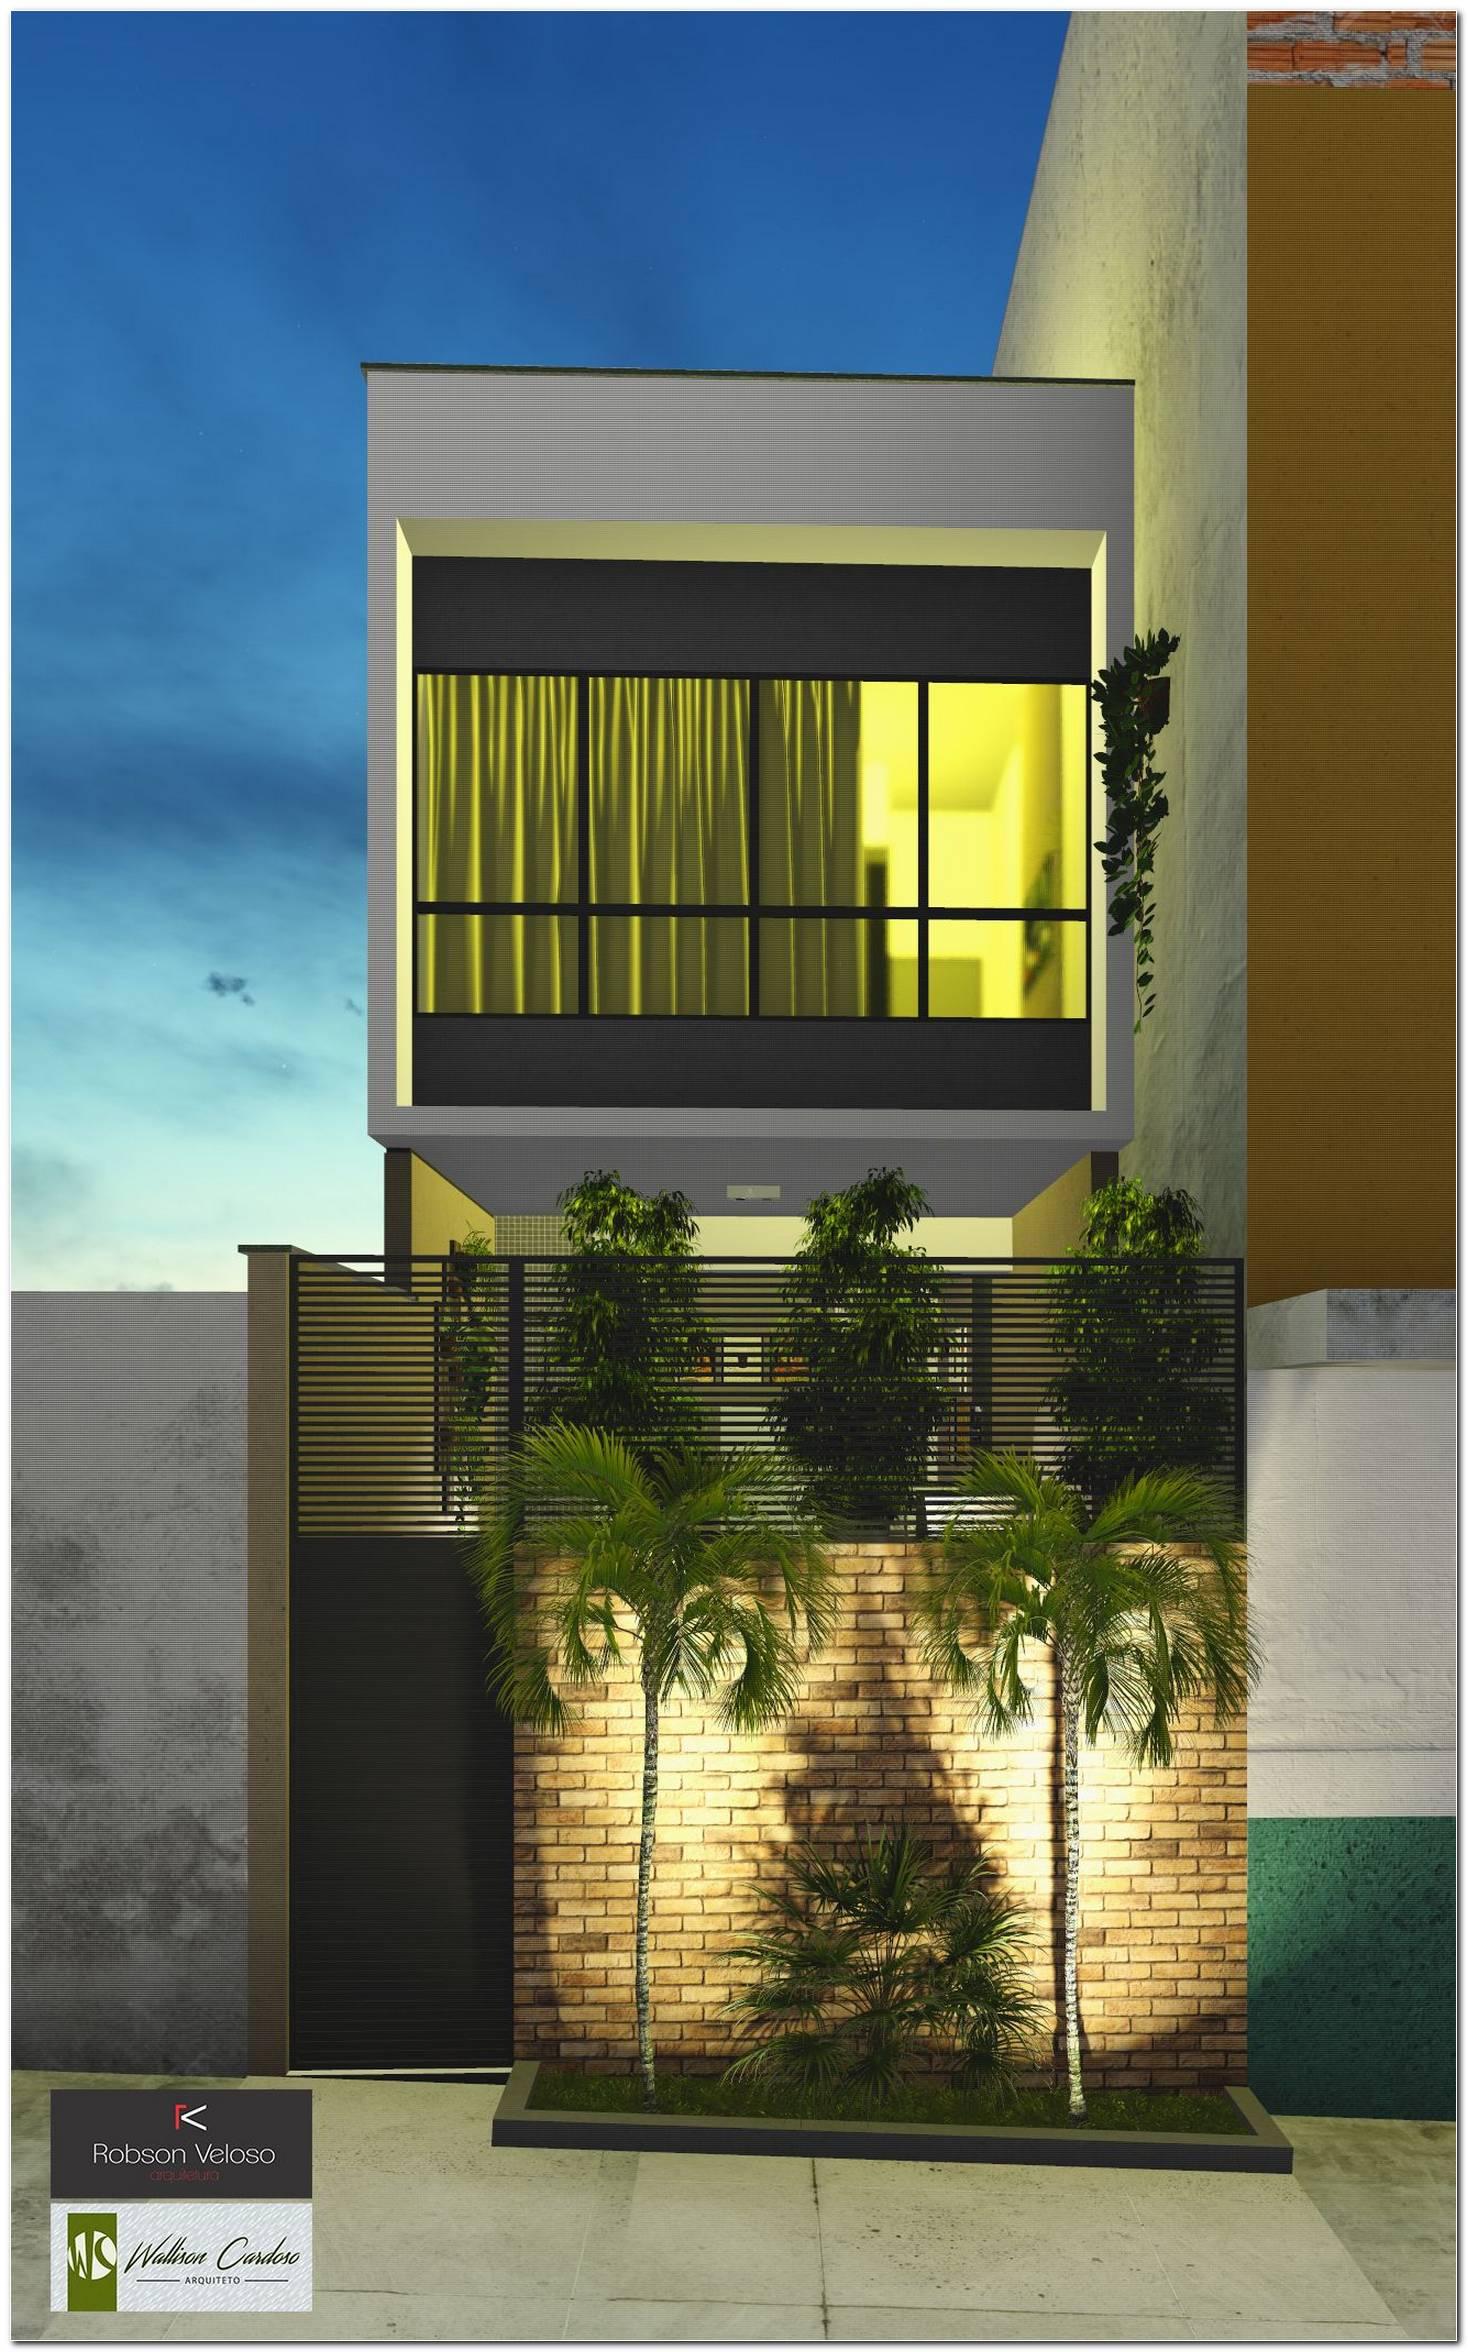 Modelos De Casas Pequenas 60 Fotos Projetos E Plantas